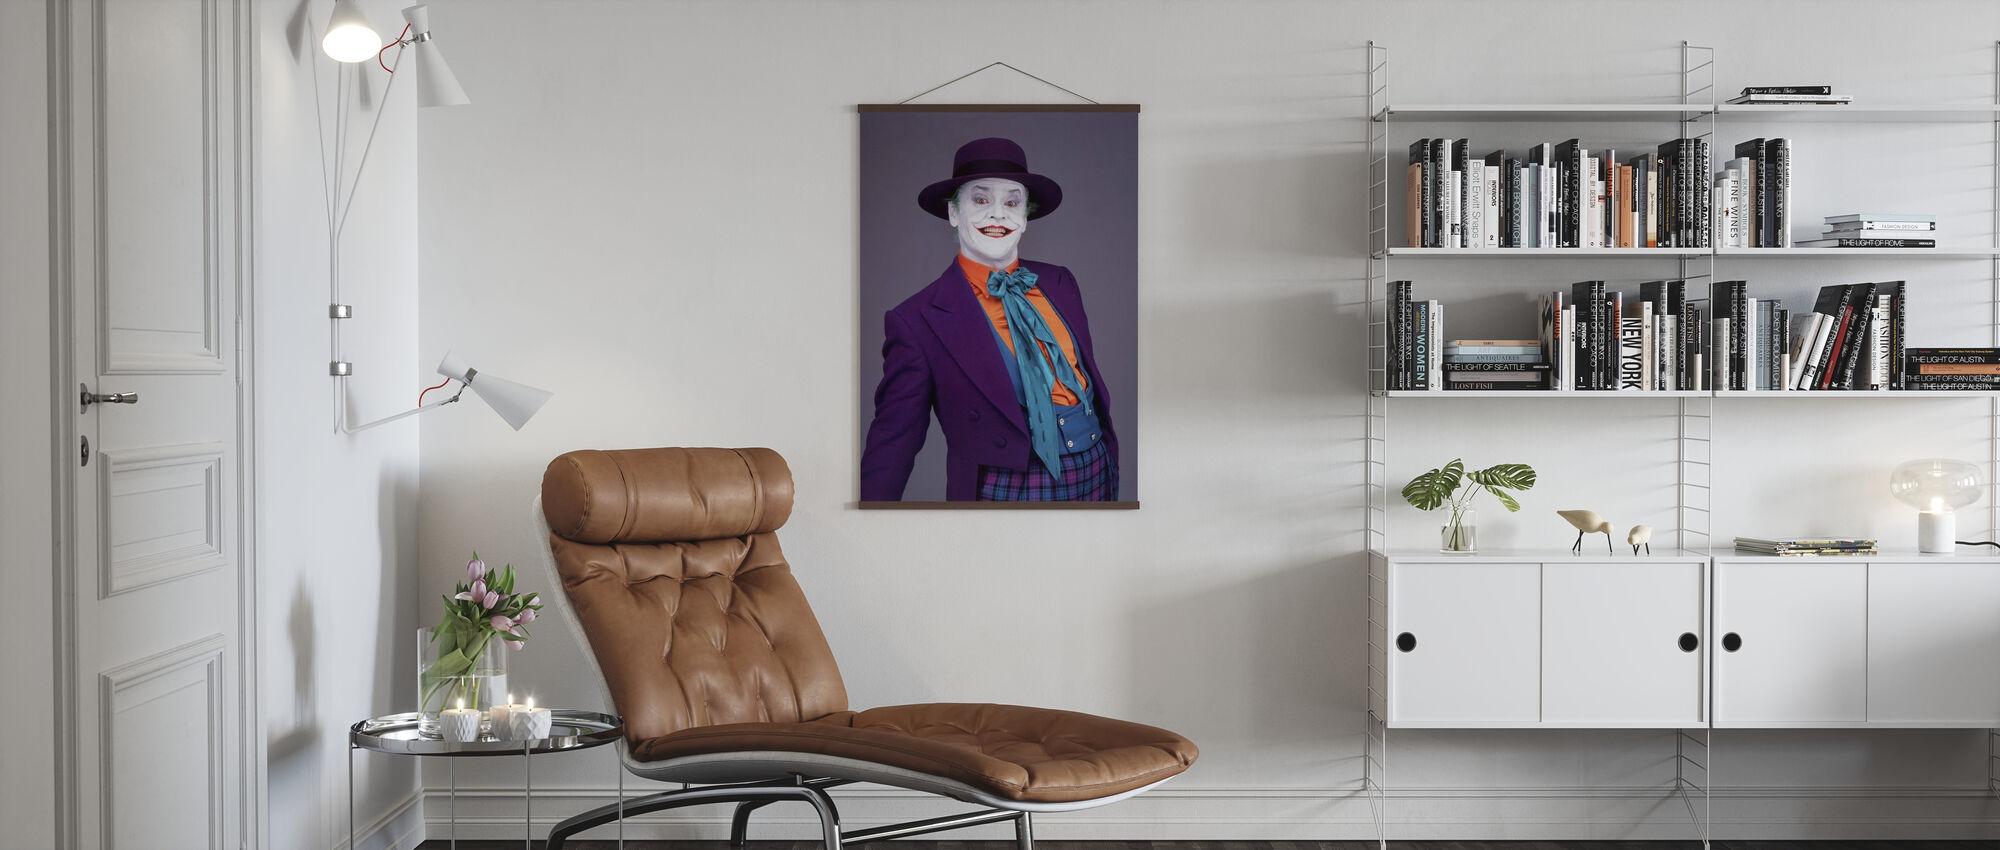 Jack Nicholson in Batman - Poster - Living Room